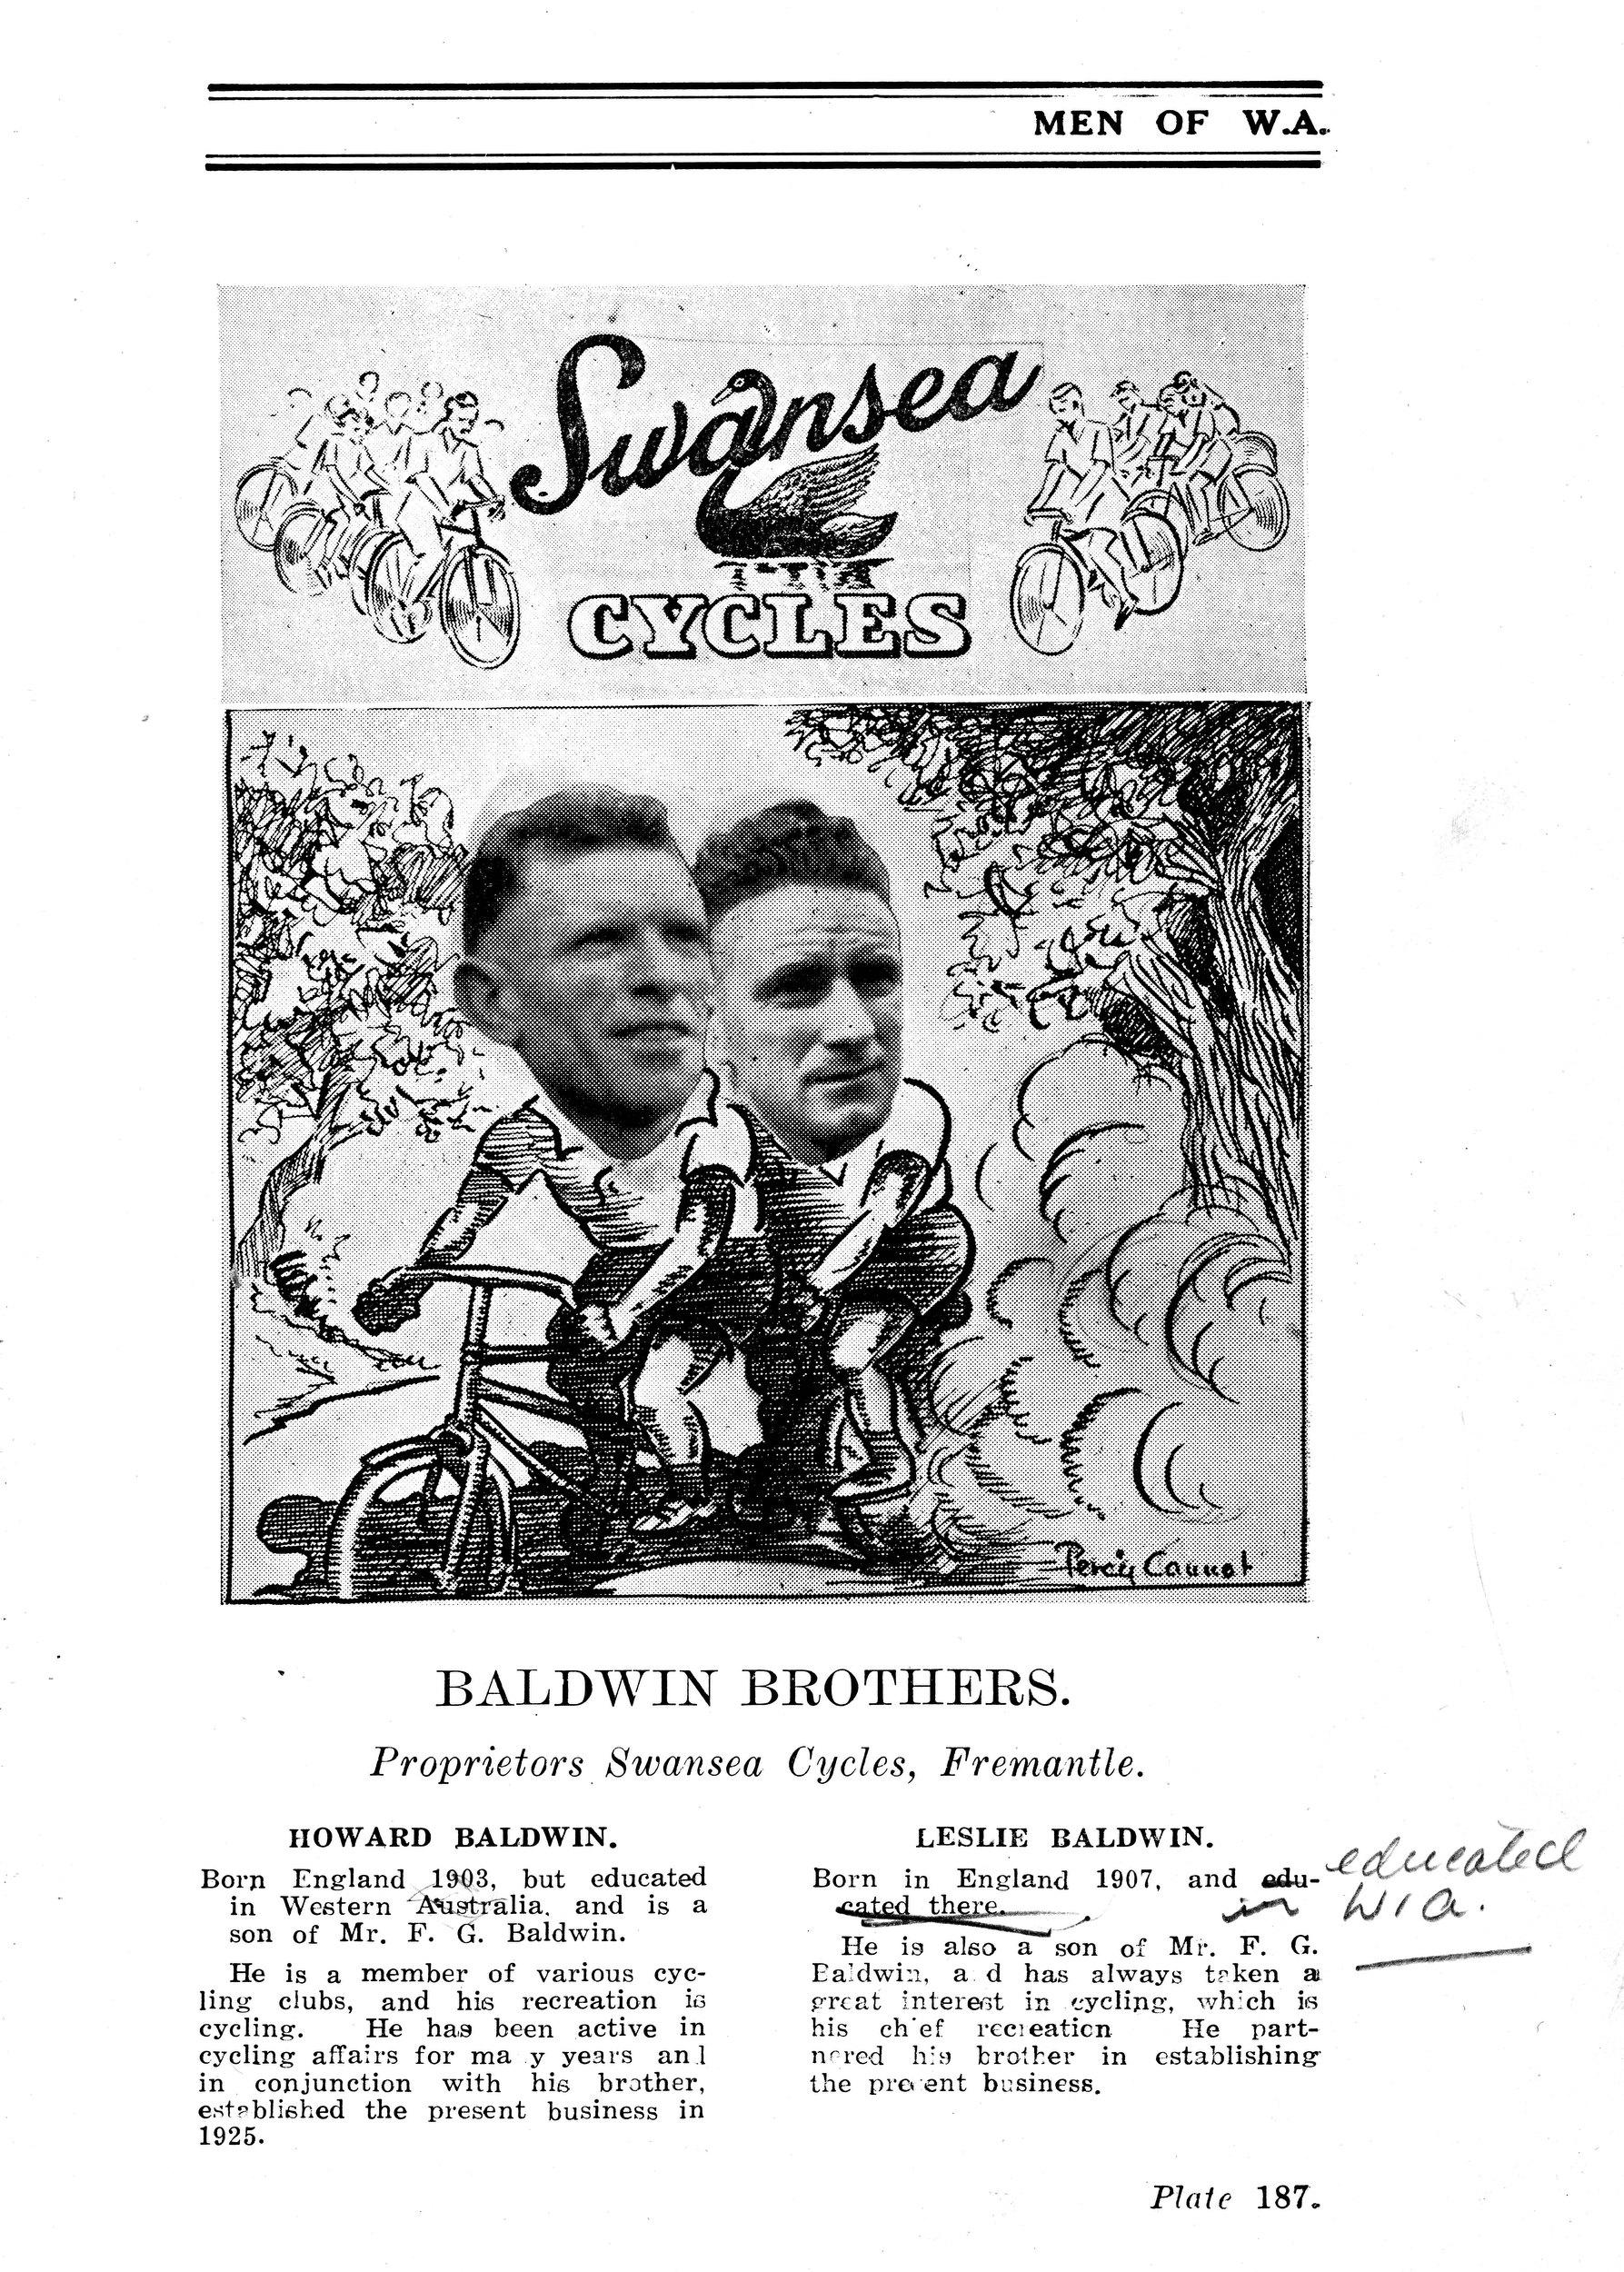 Howard & Leslie Baldwin in 'Men of WA' published 1937_sp.jpg